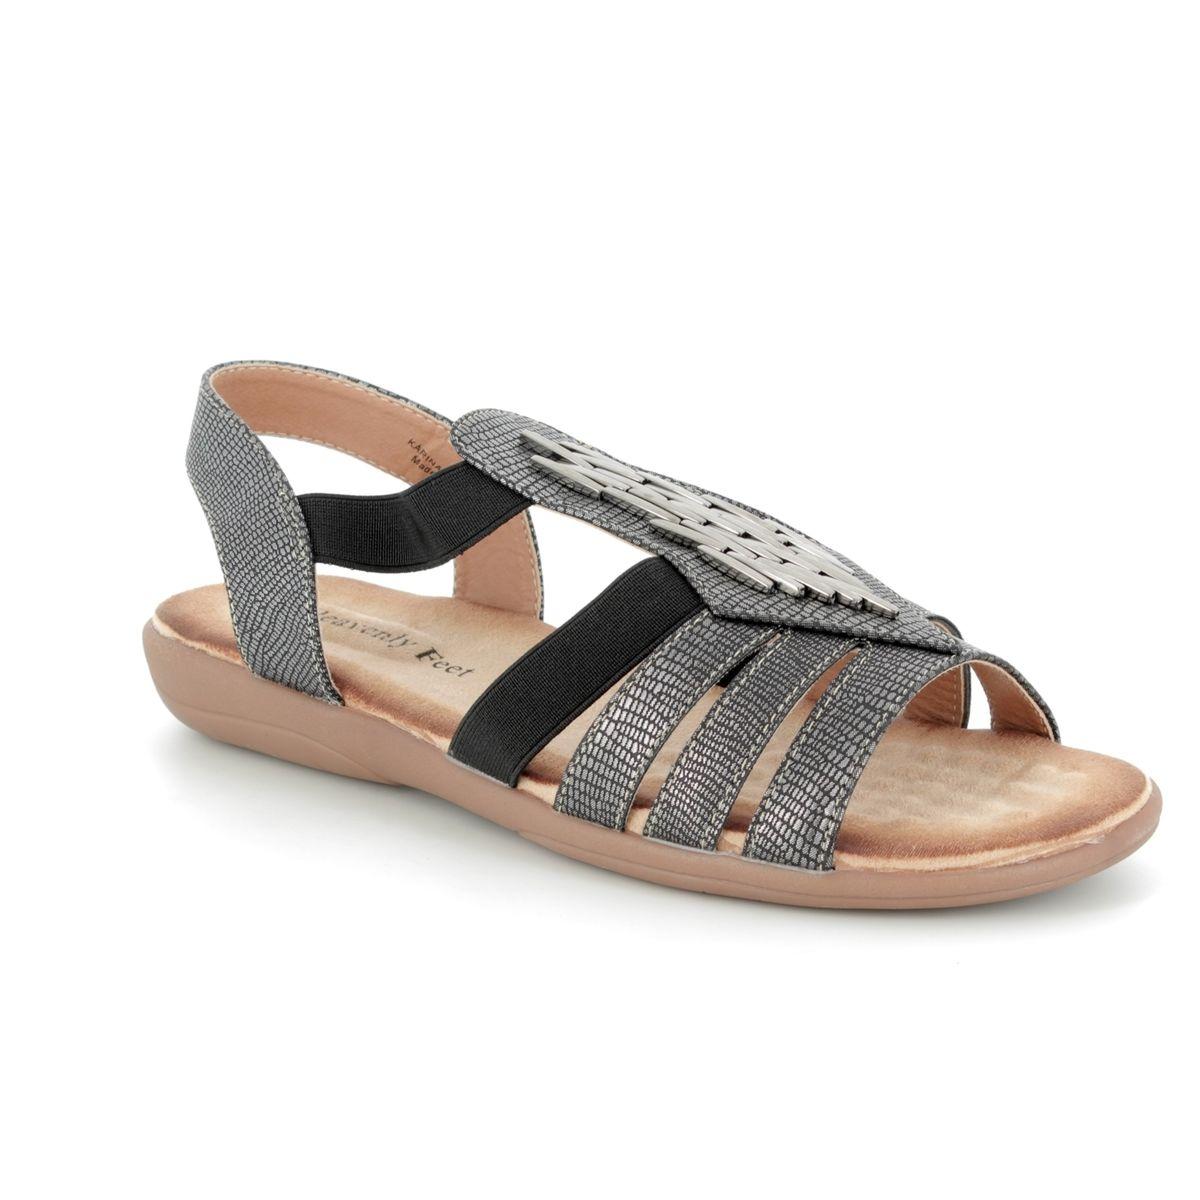 9fad24ec Heavenly Feet Sandals - Pewter - 8108/51 KARINA